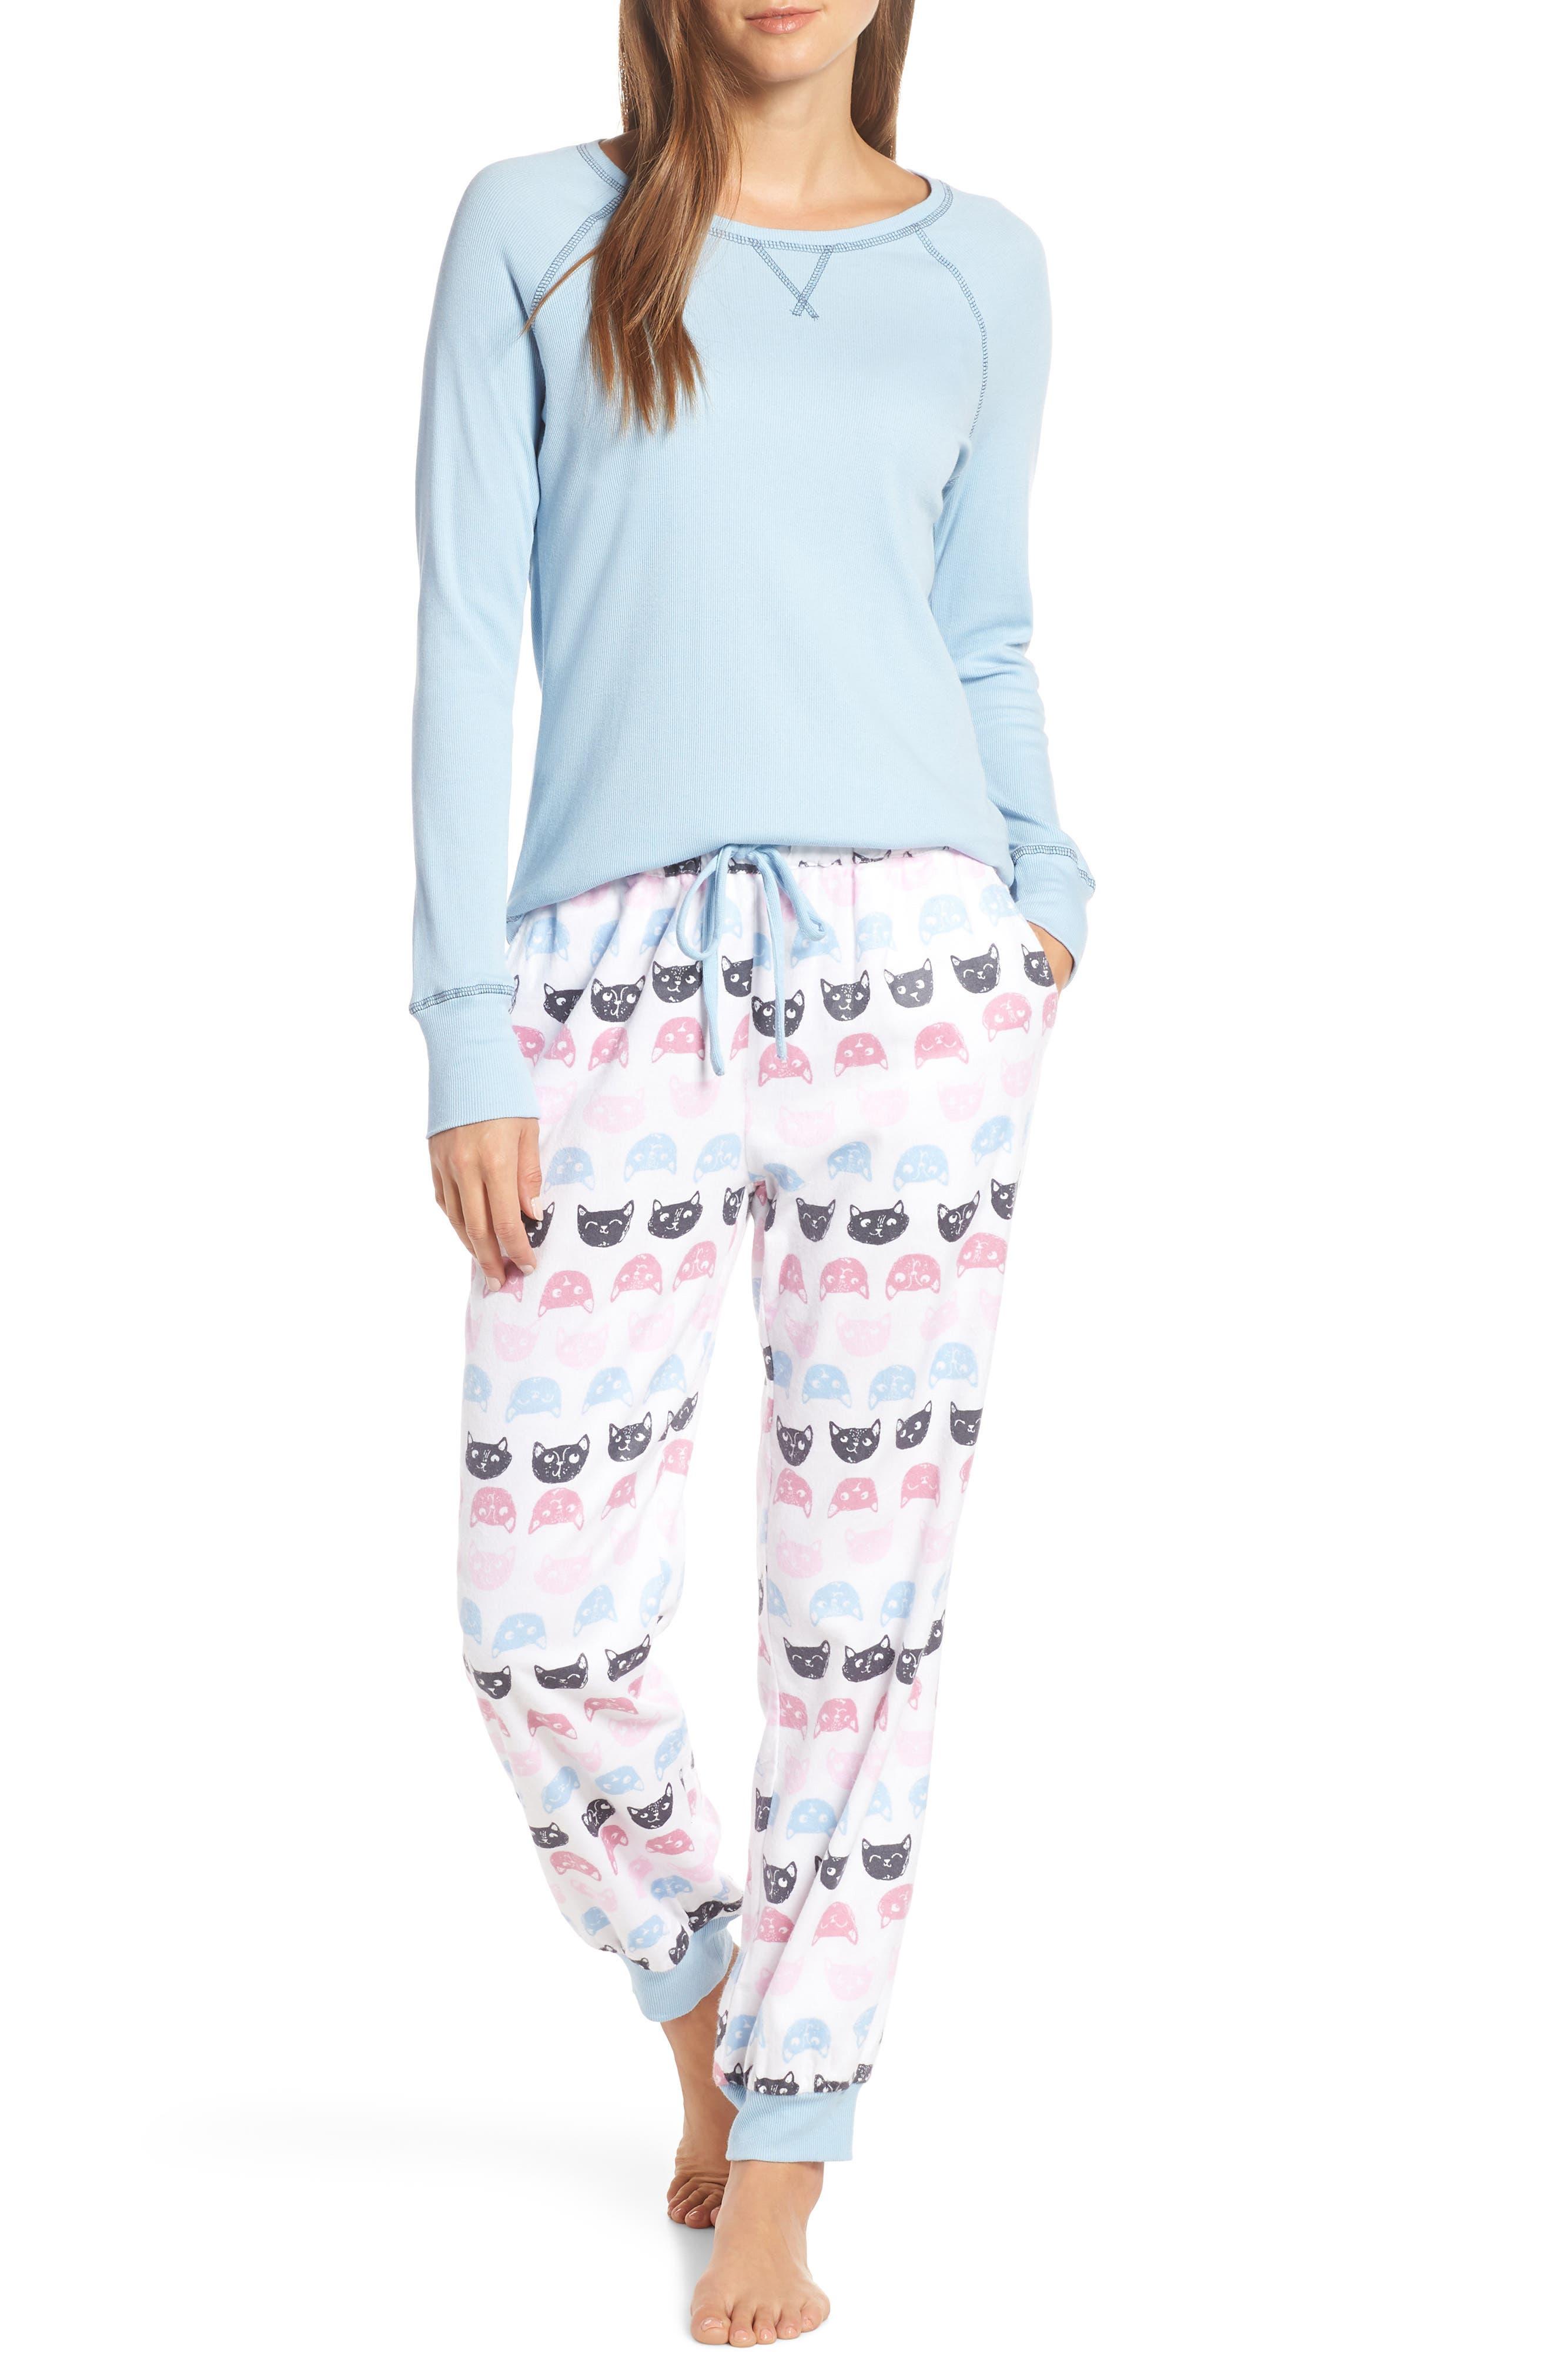 MUNKI MUNKI Knit & Flannel Pajamas, Main, color, WHITE CATS